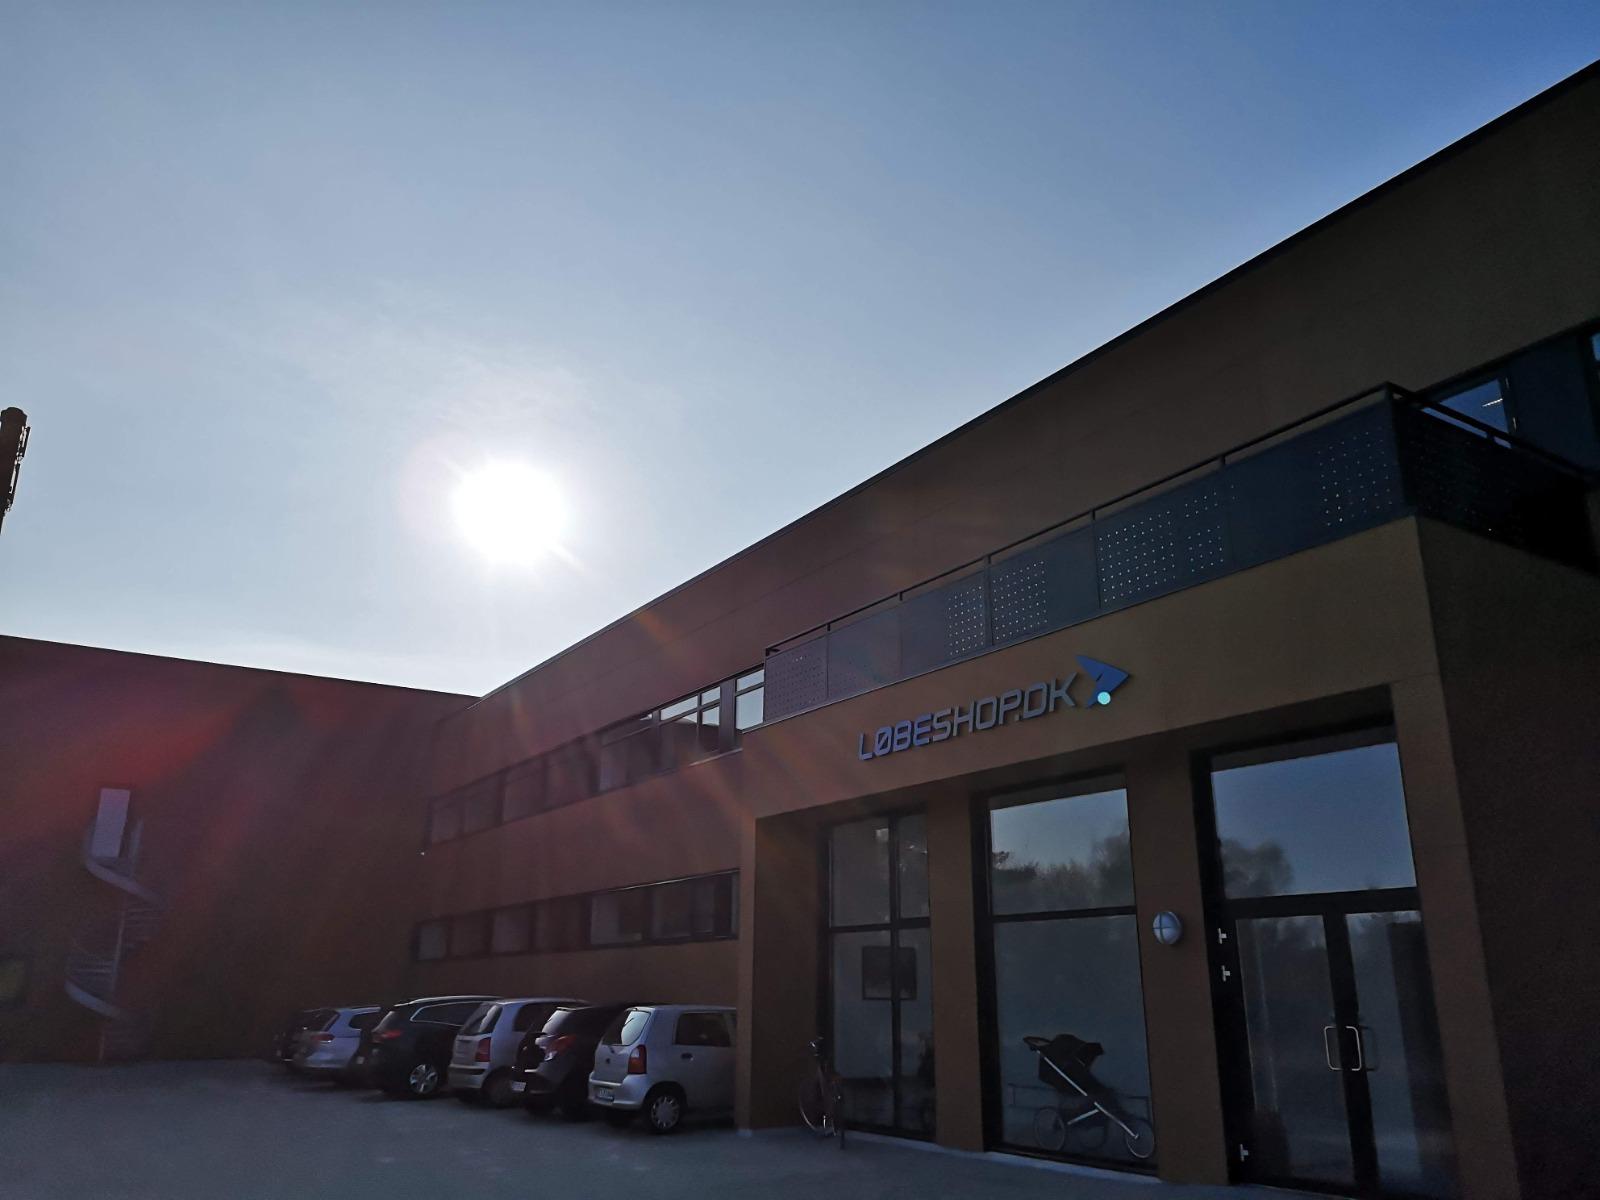 Hjulfabrikken facade